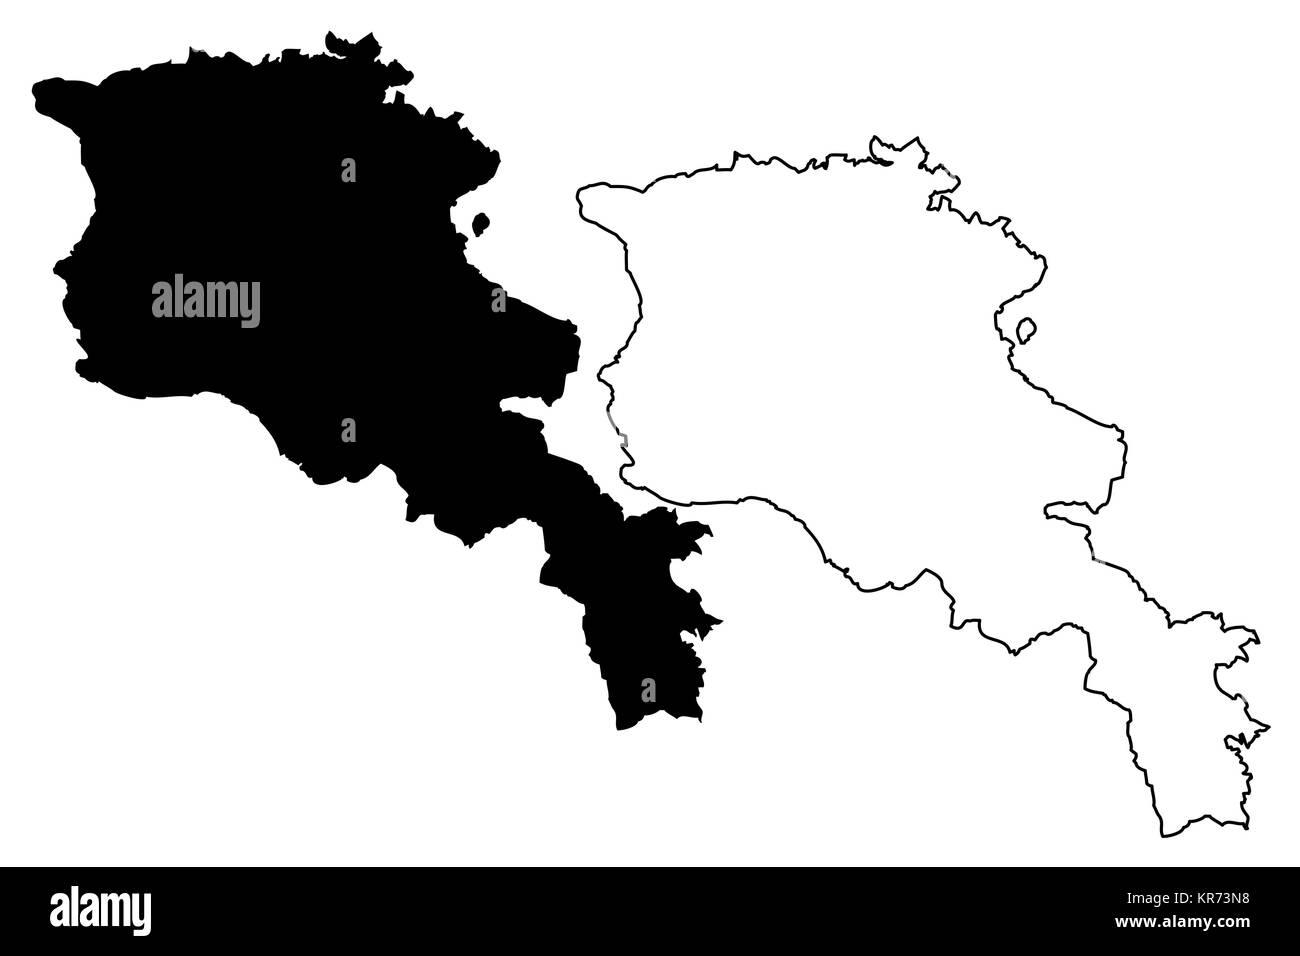 Armenia map vector illustration, scribble sketch Republic of Armenia - Stock Image